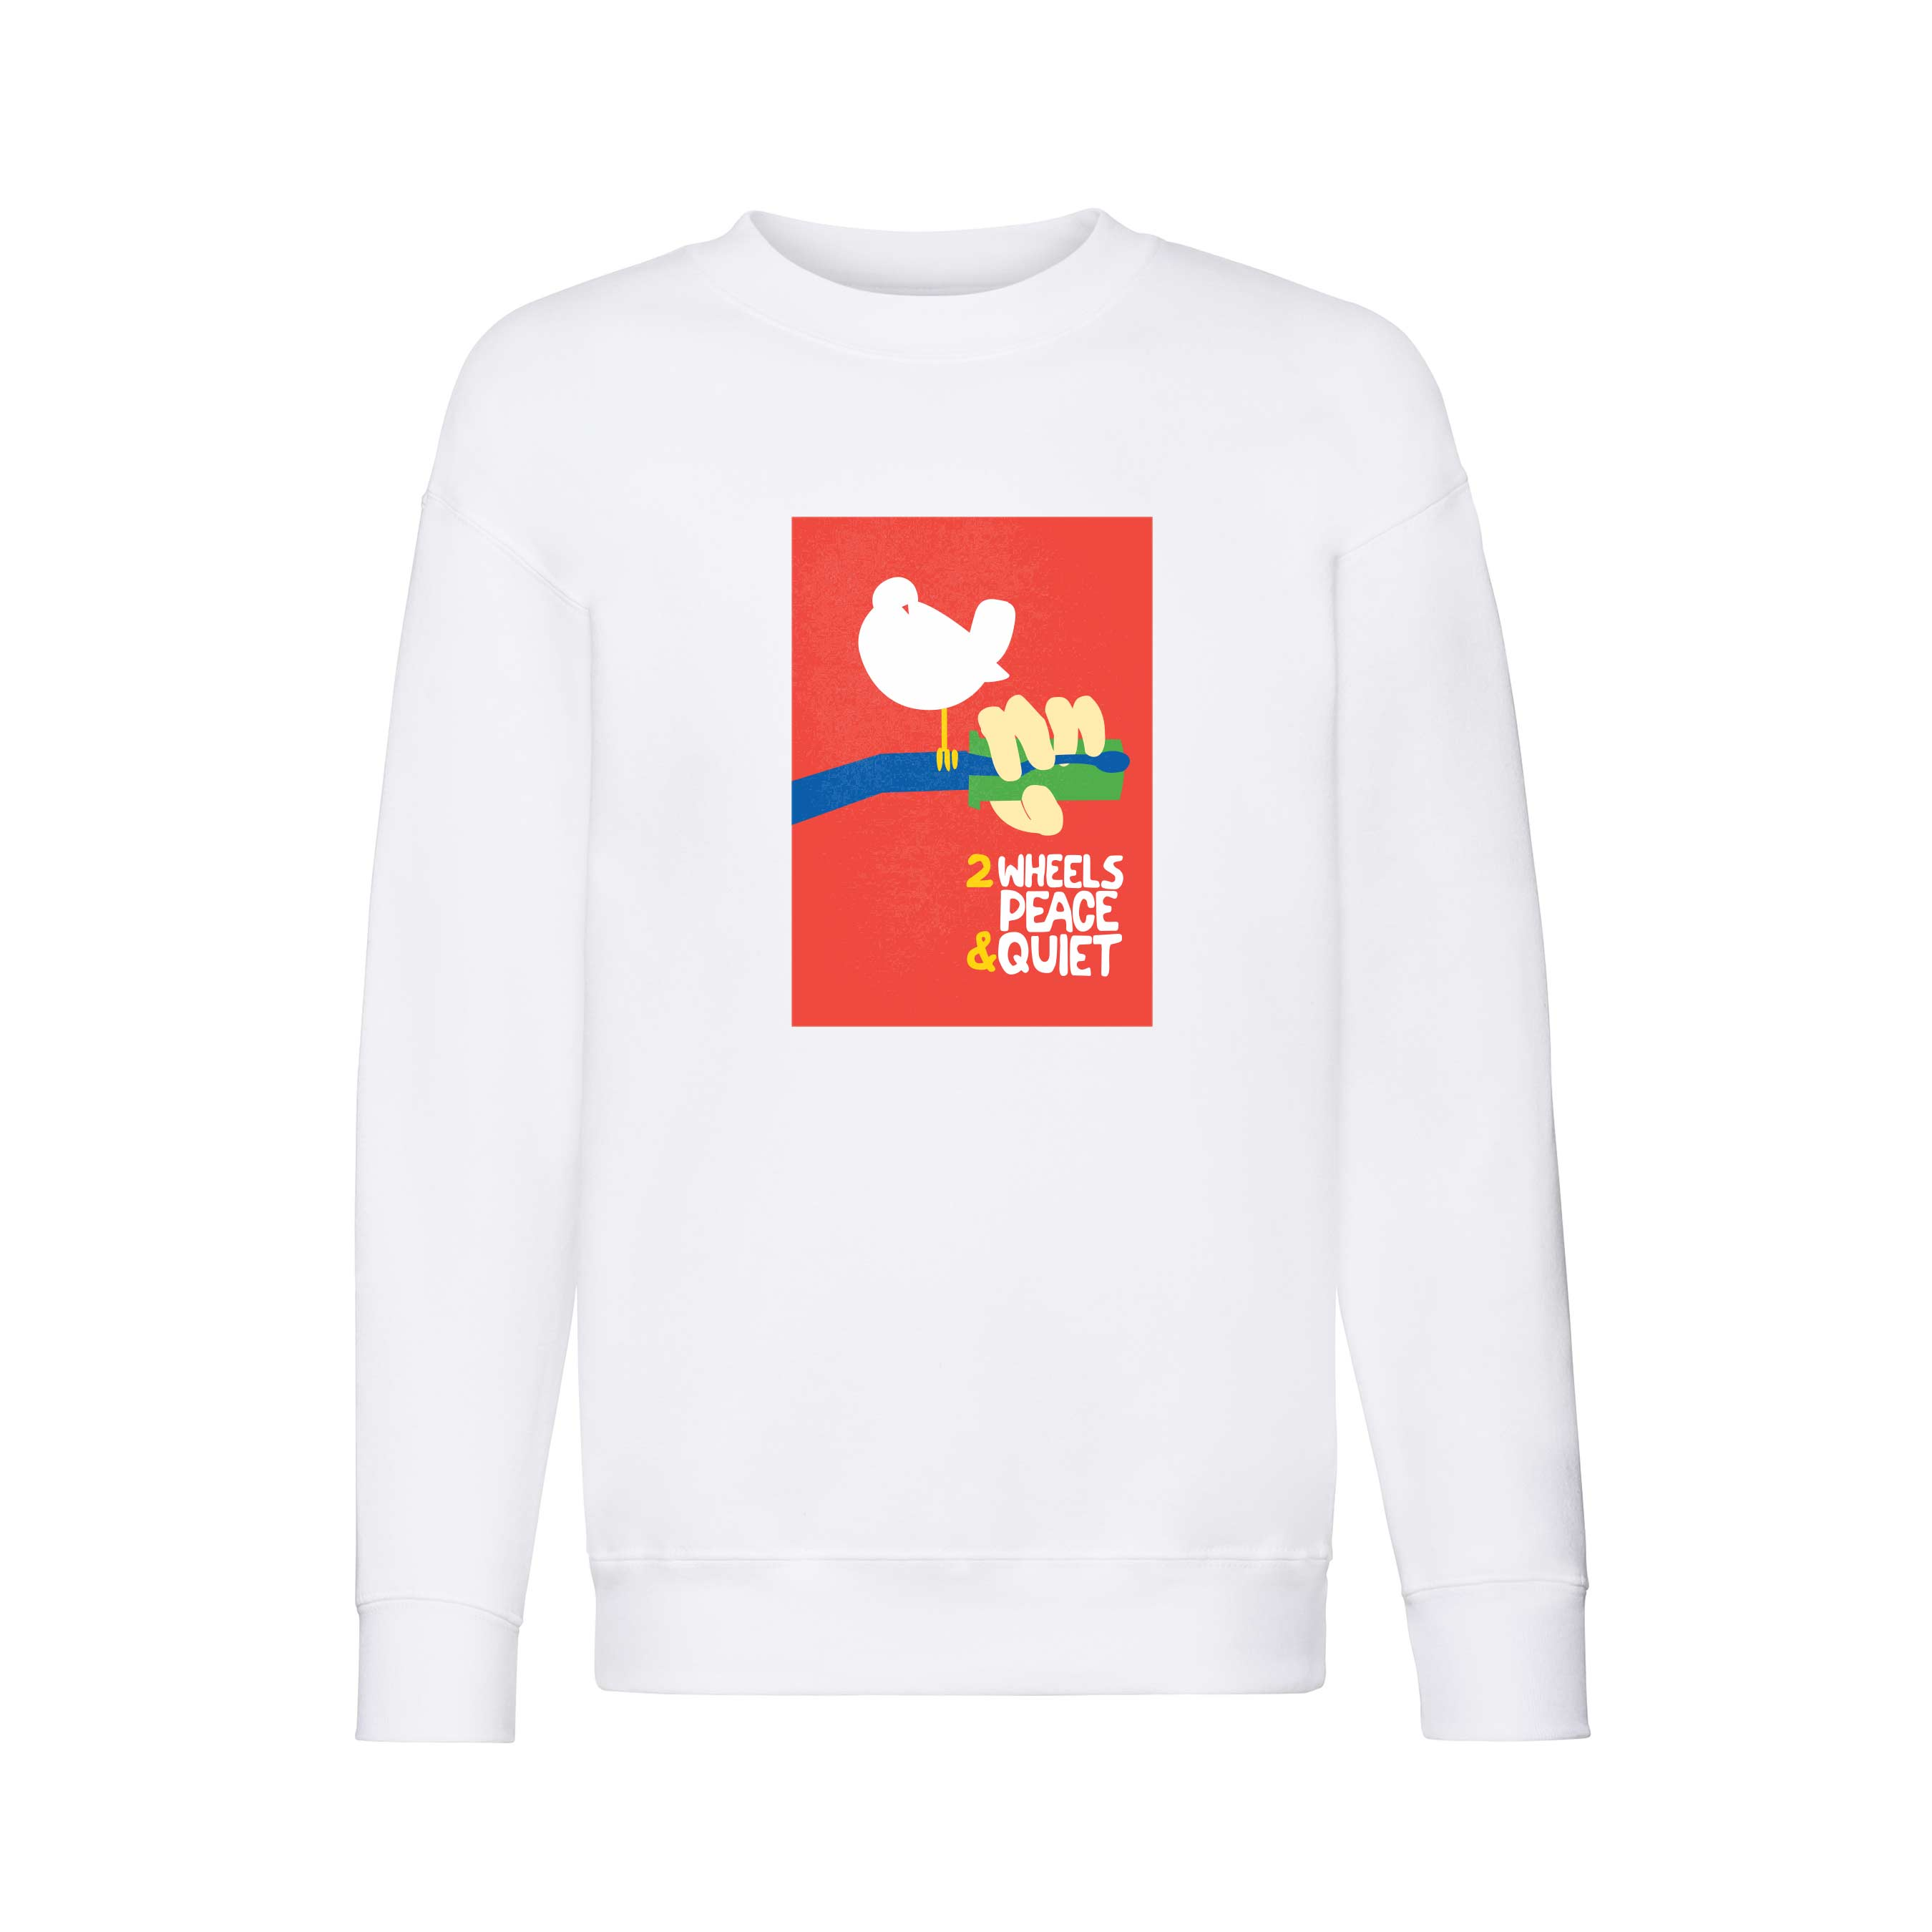 2 Wheels Peace design for t-shirt, hoodie & sweatshirt